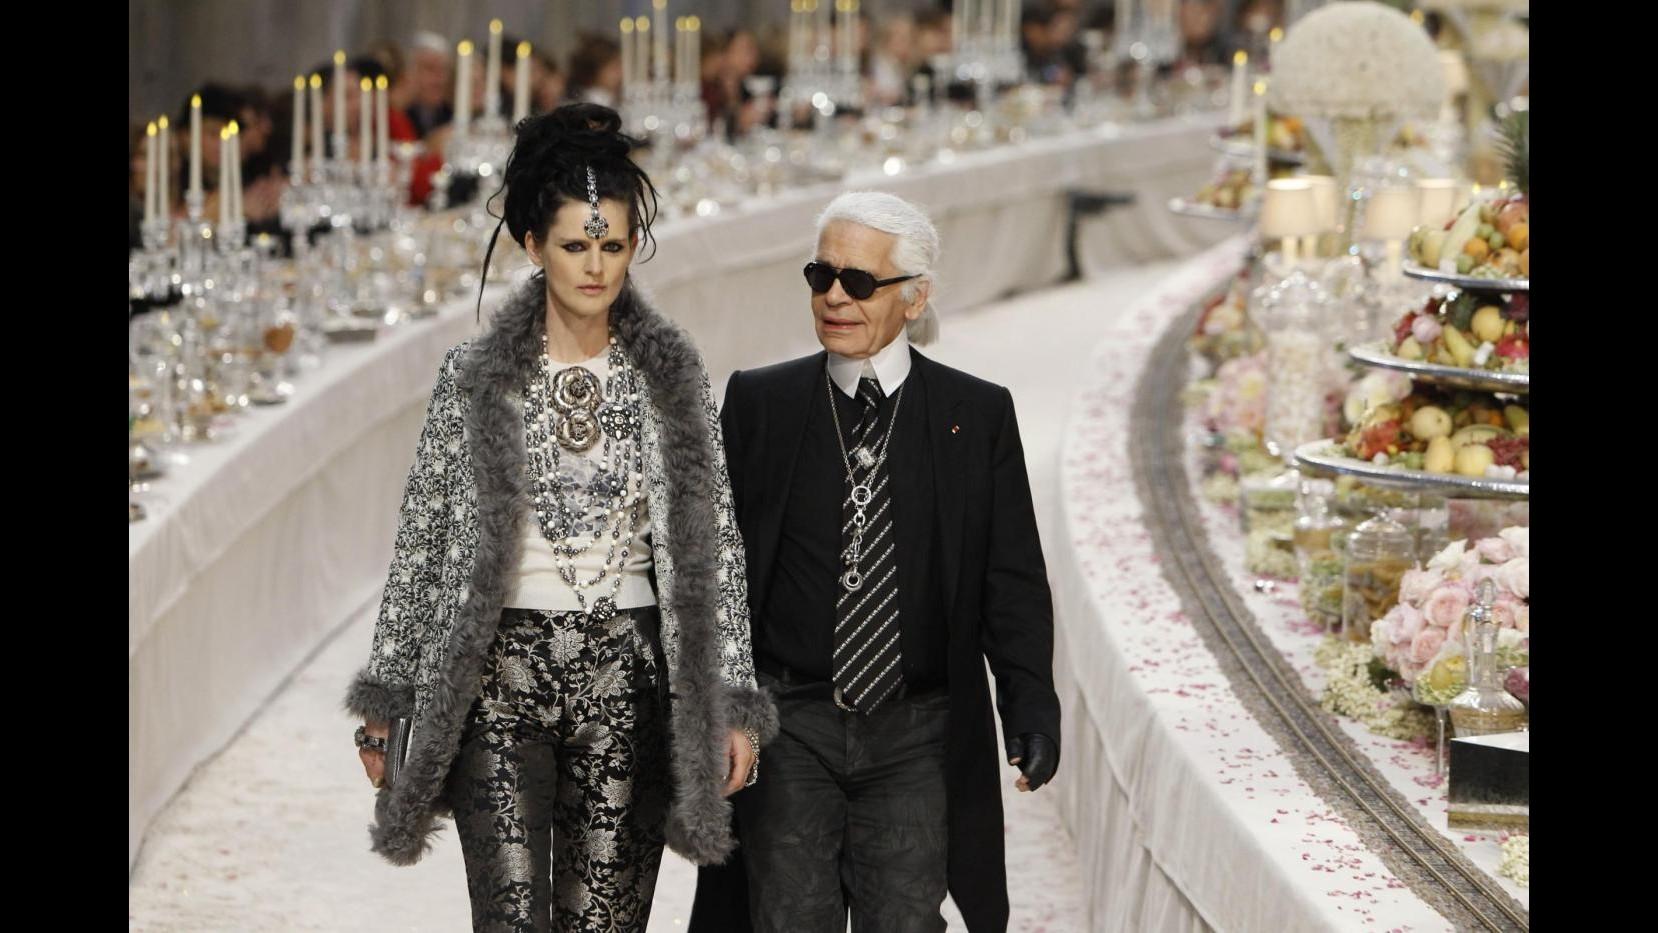 Sfilata Chanel, atmosfere indiane al 'Métiers d'art show'